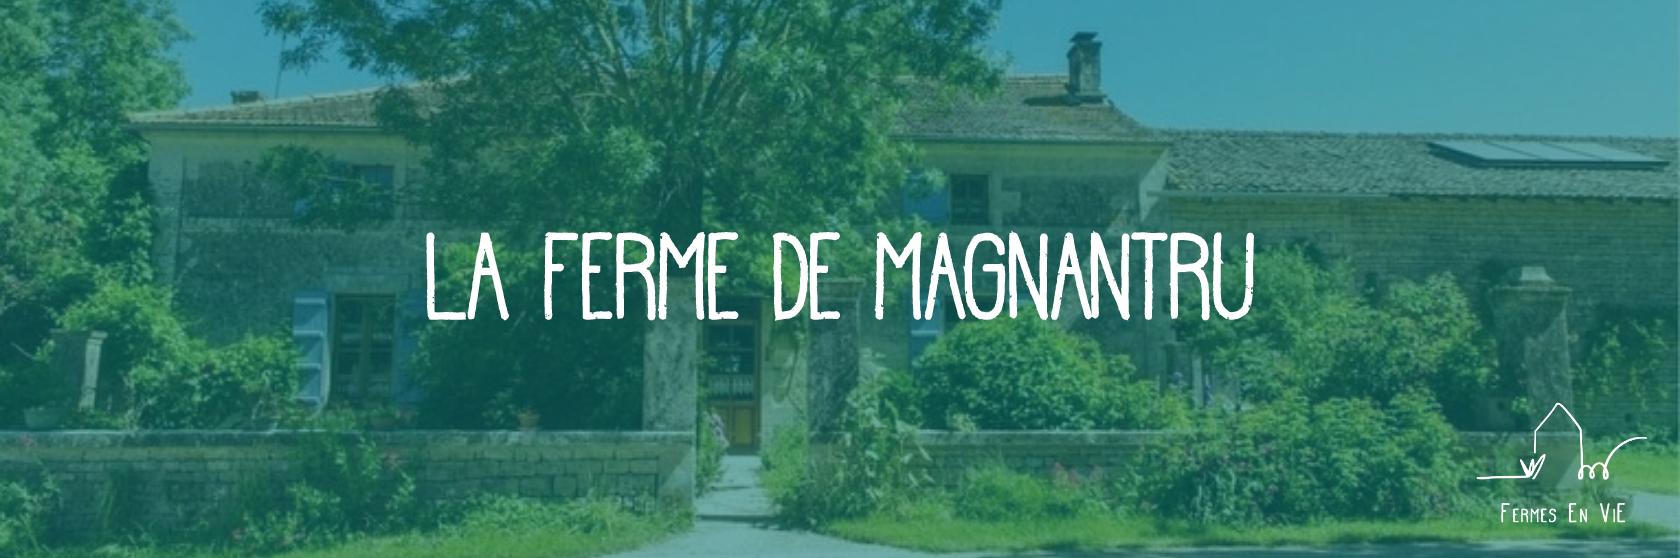 HeaderFermes_Magnantru (1)